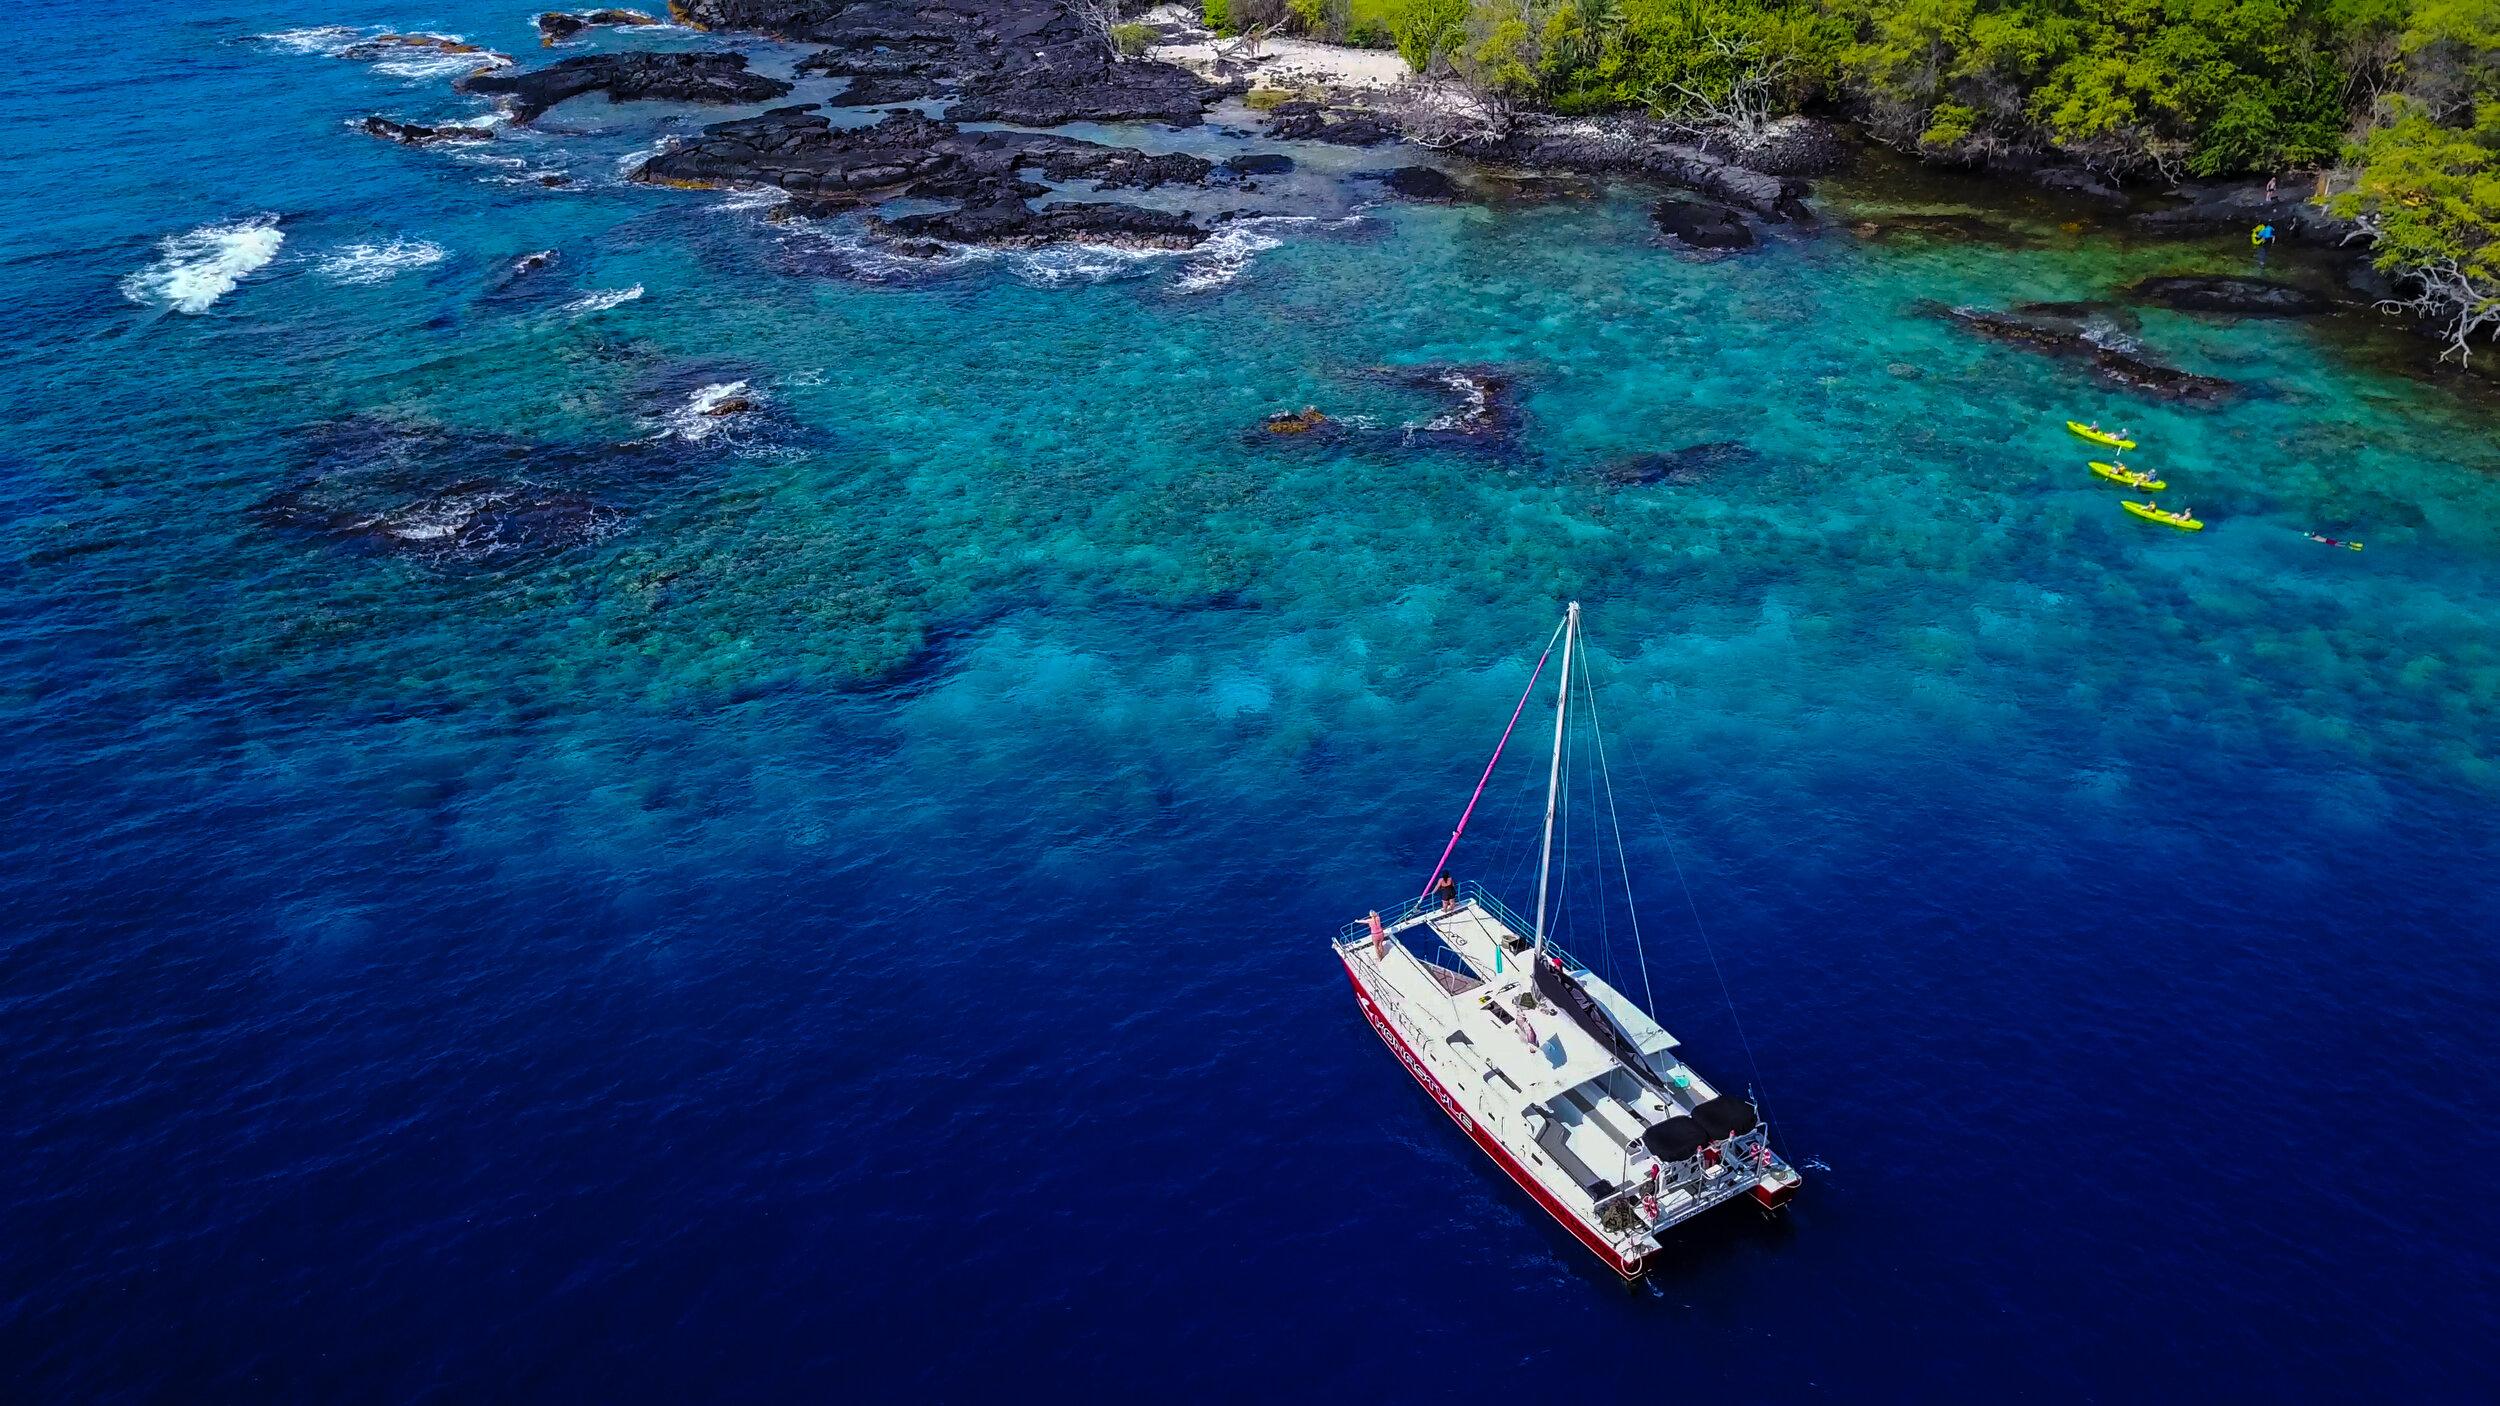 Product Morning Kealakekua Snorkel and Sail